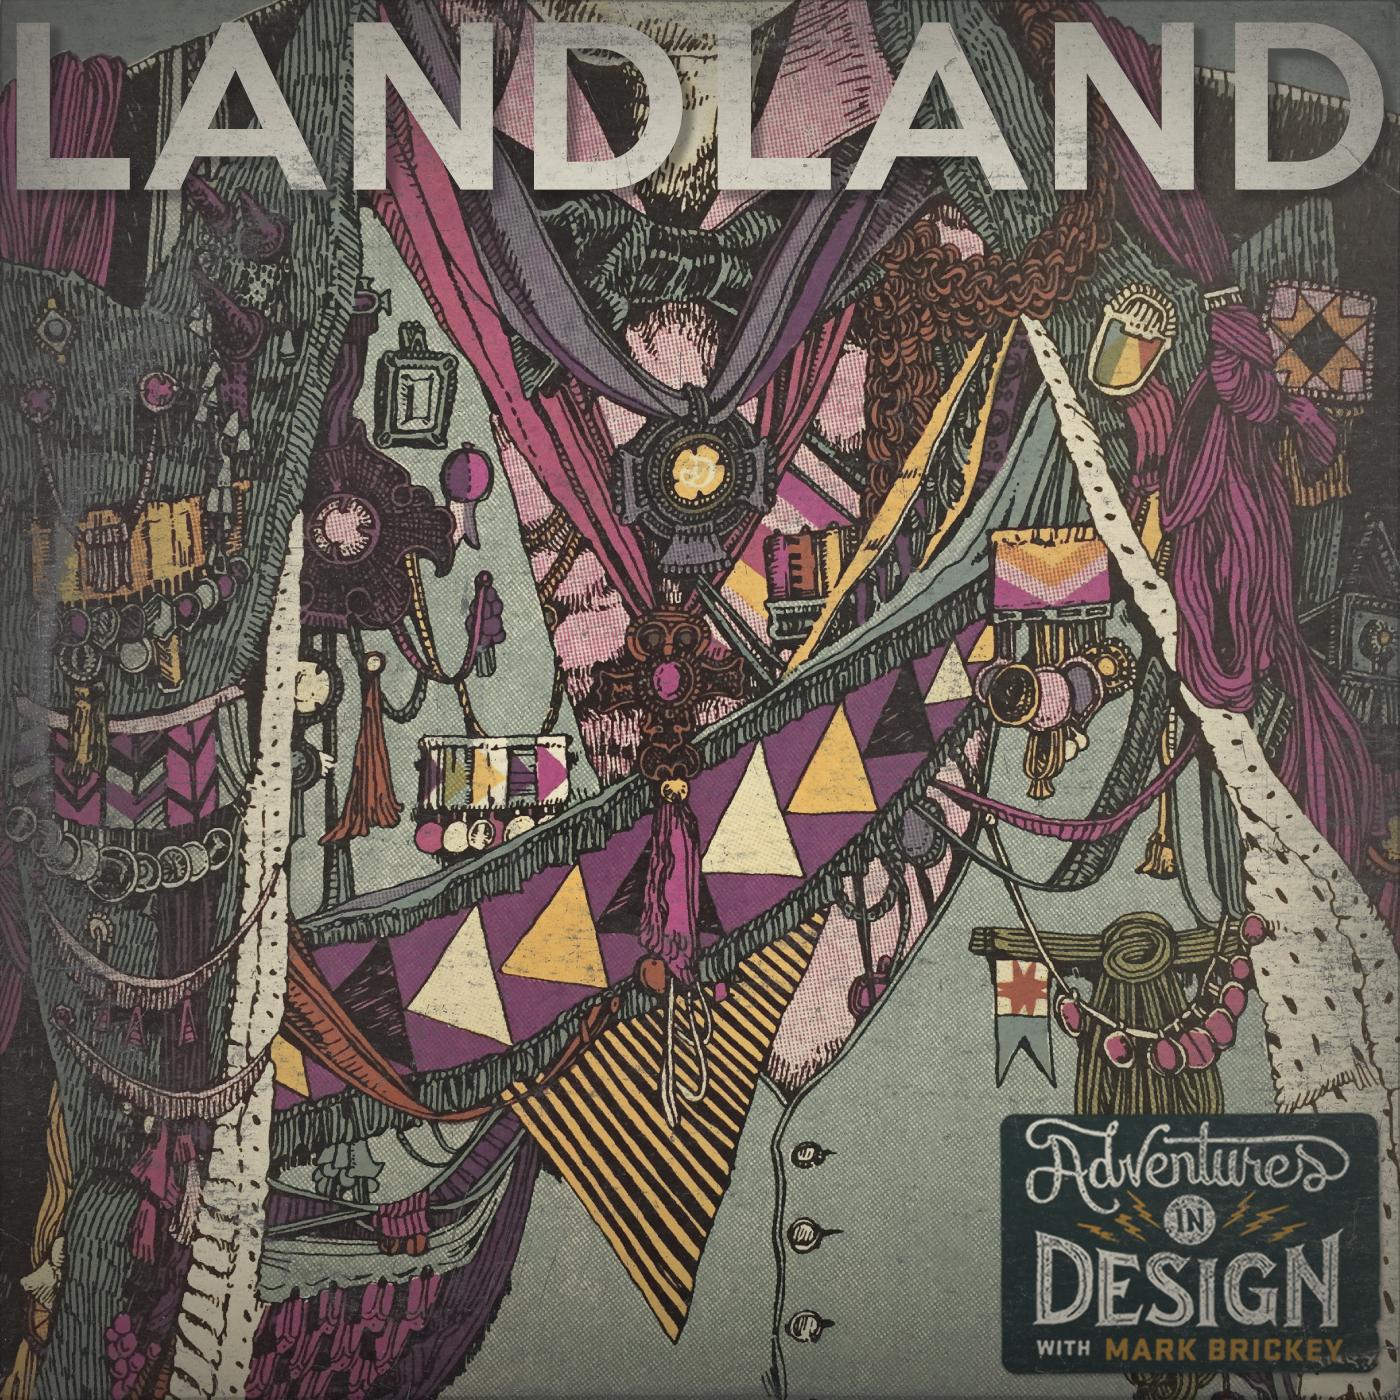 Episode 366 - Landland Dan Black & Jessica Seamans